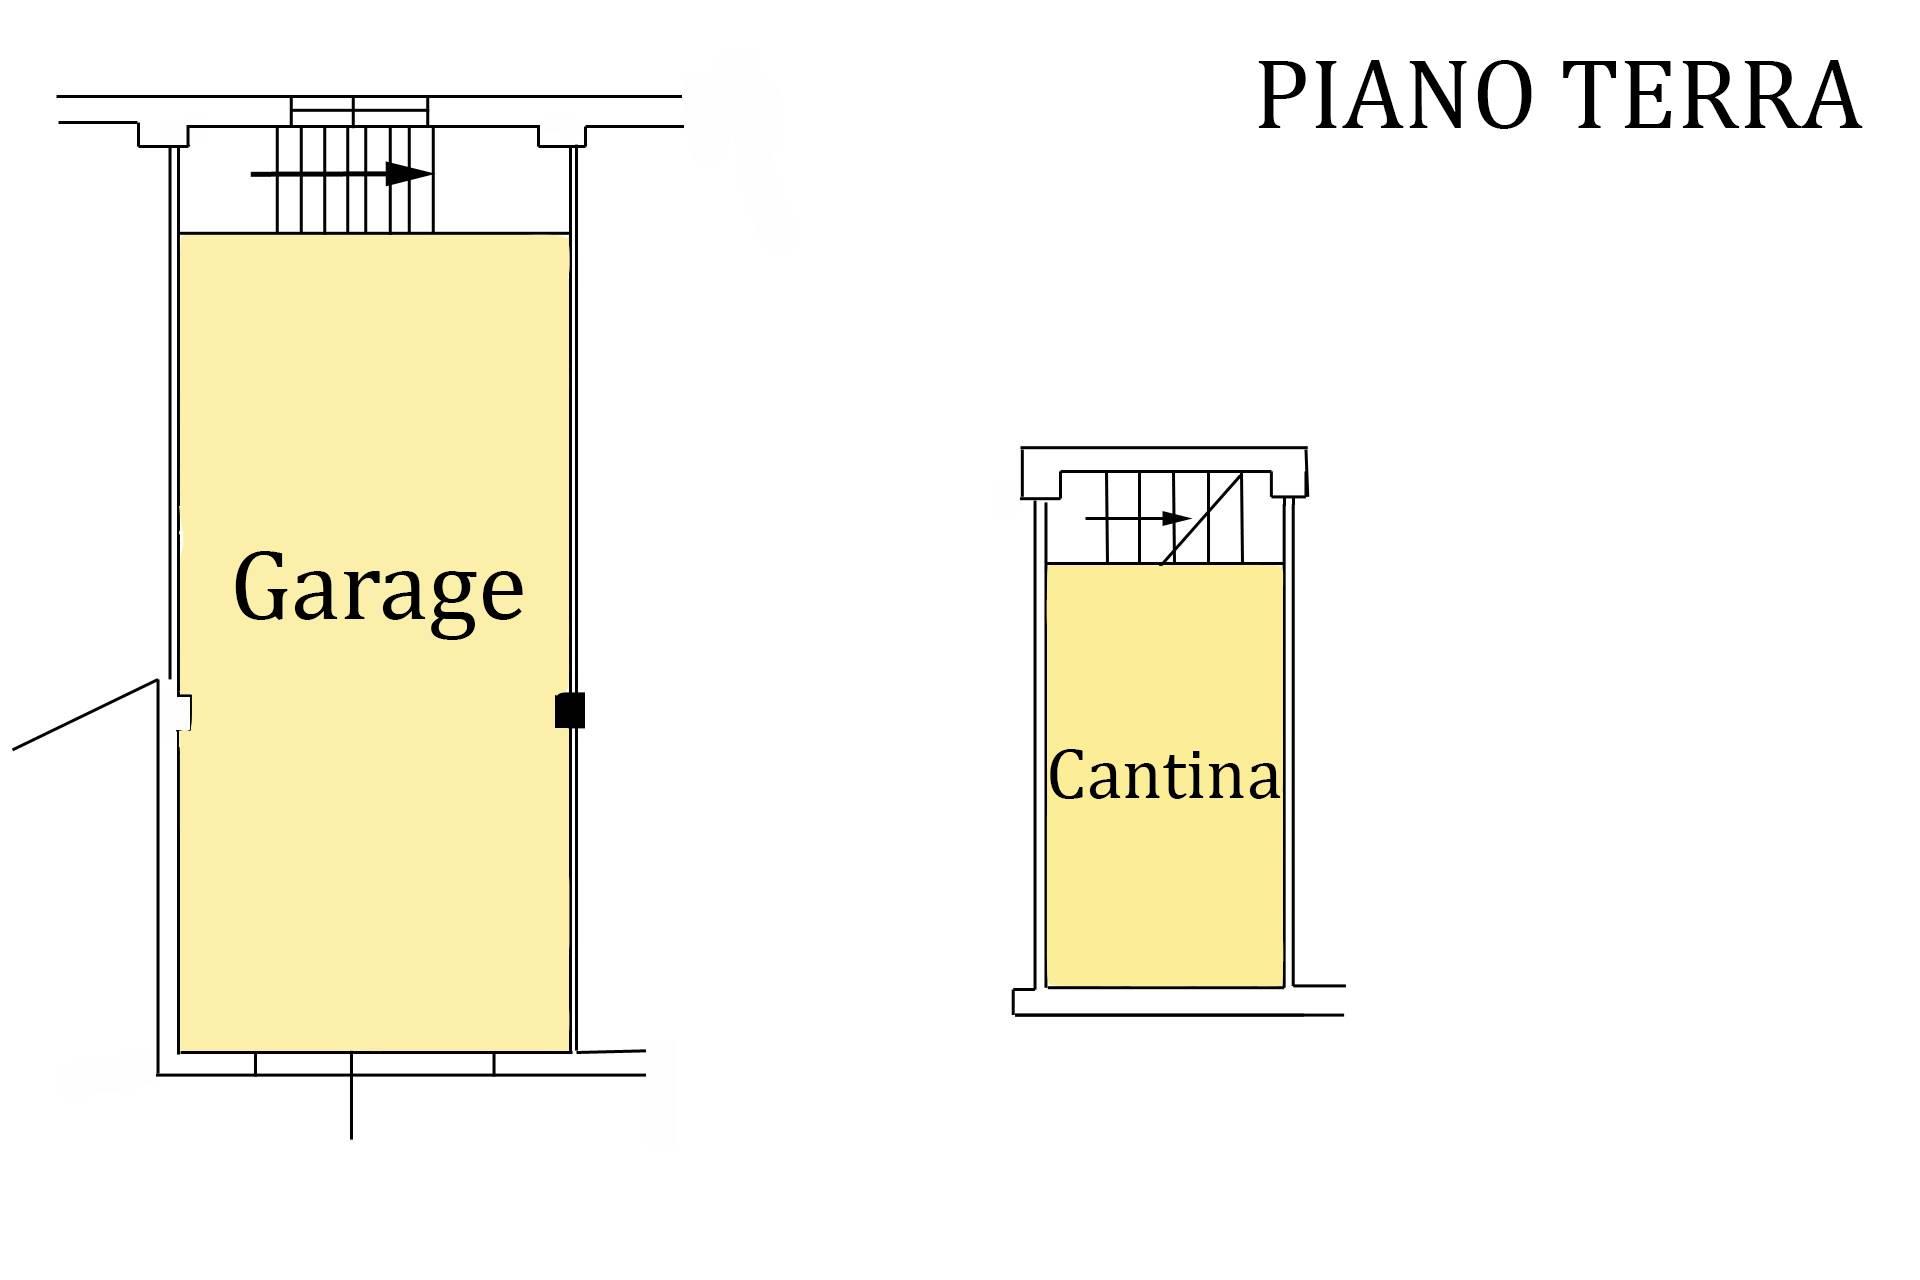 Planimetria garage e cantina